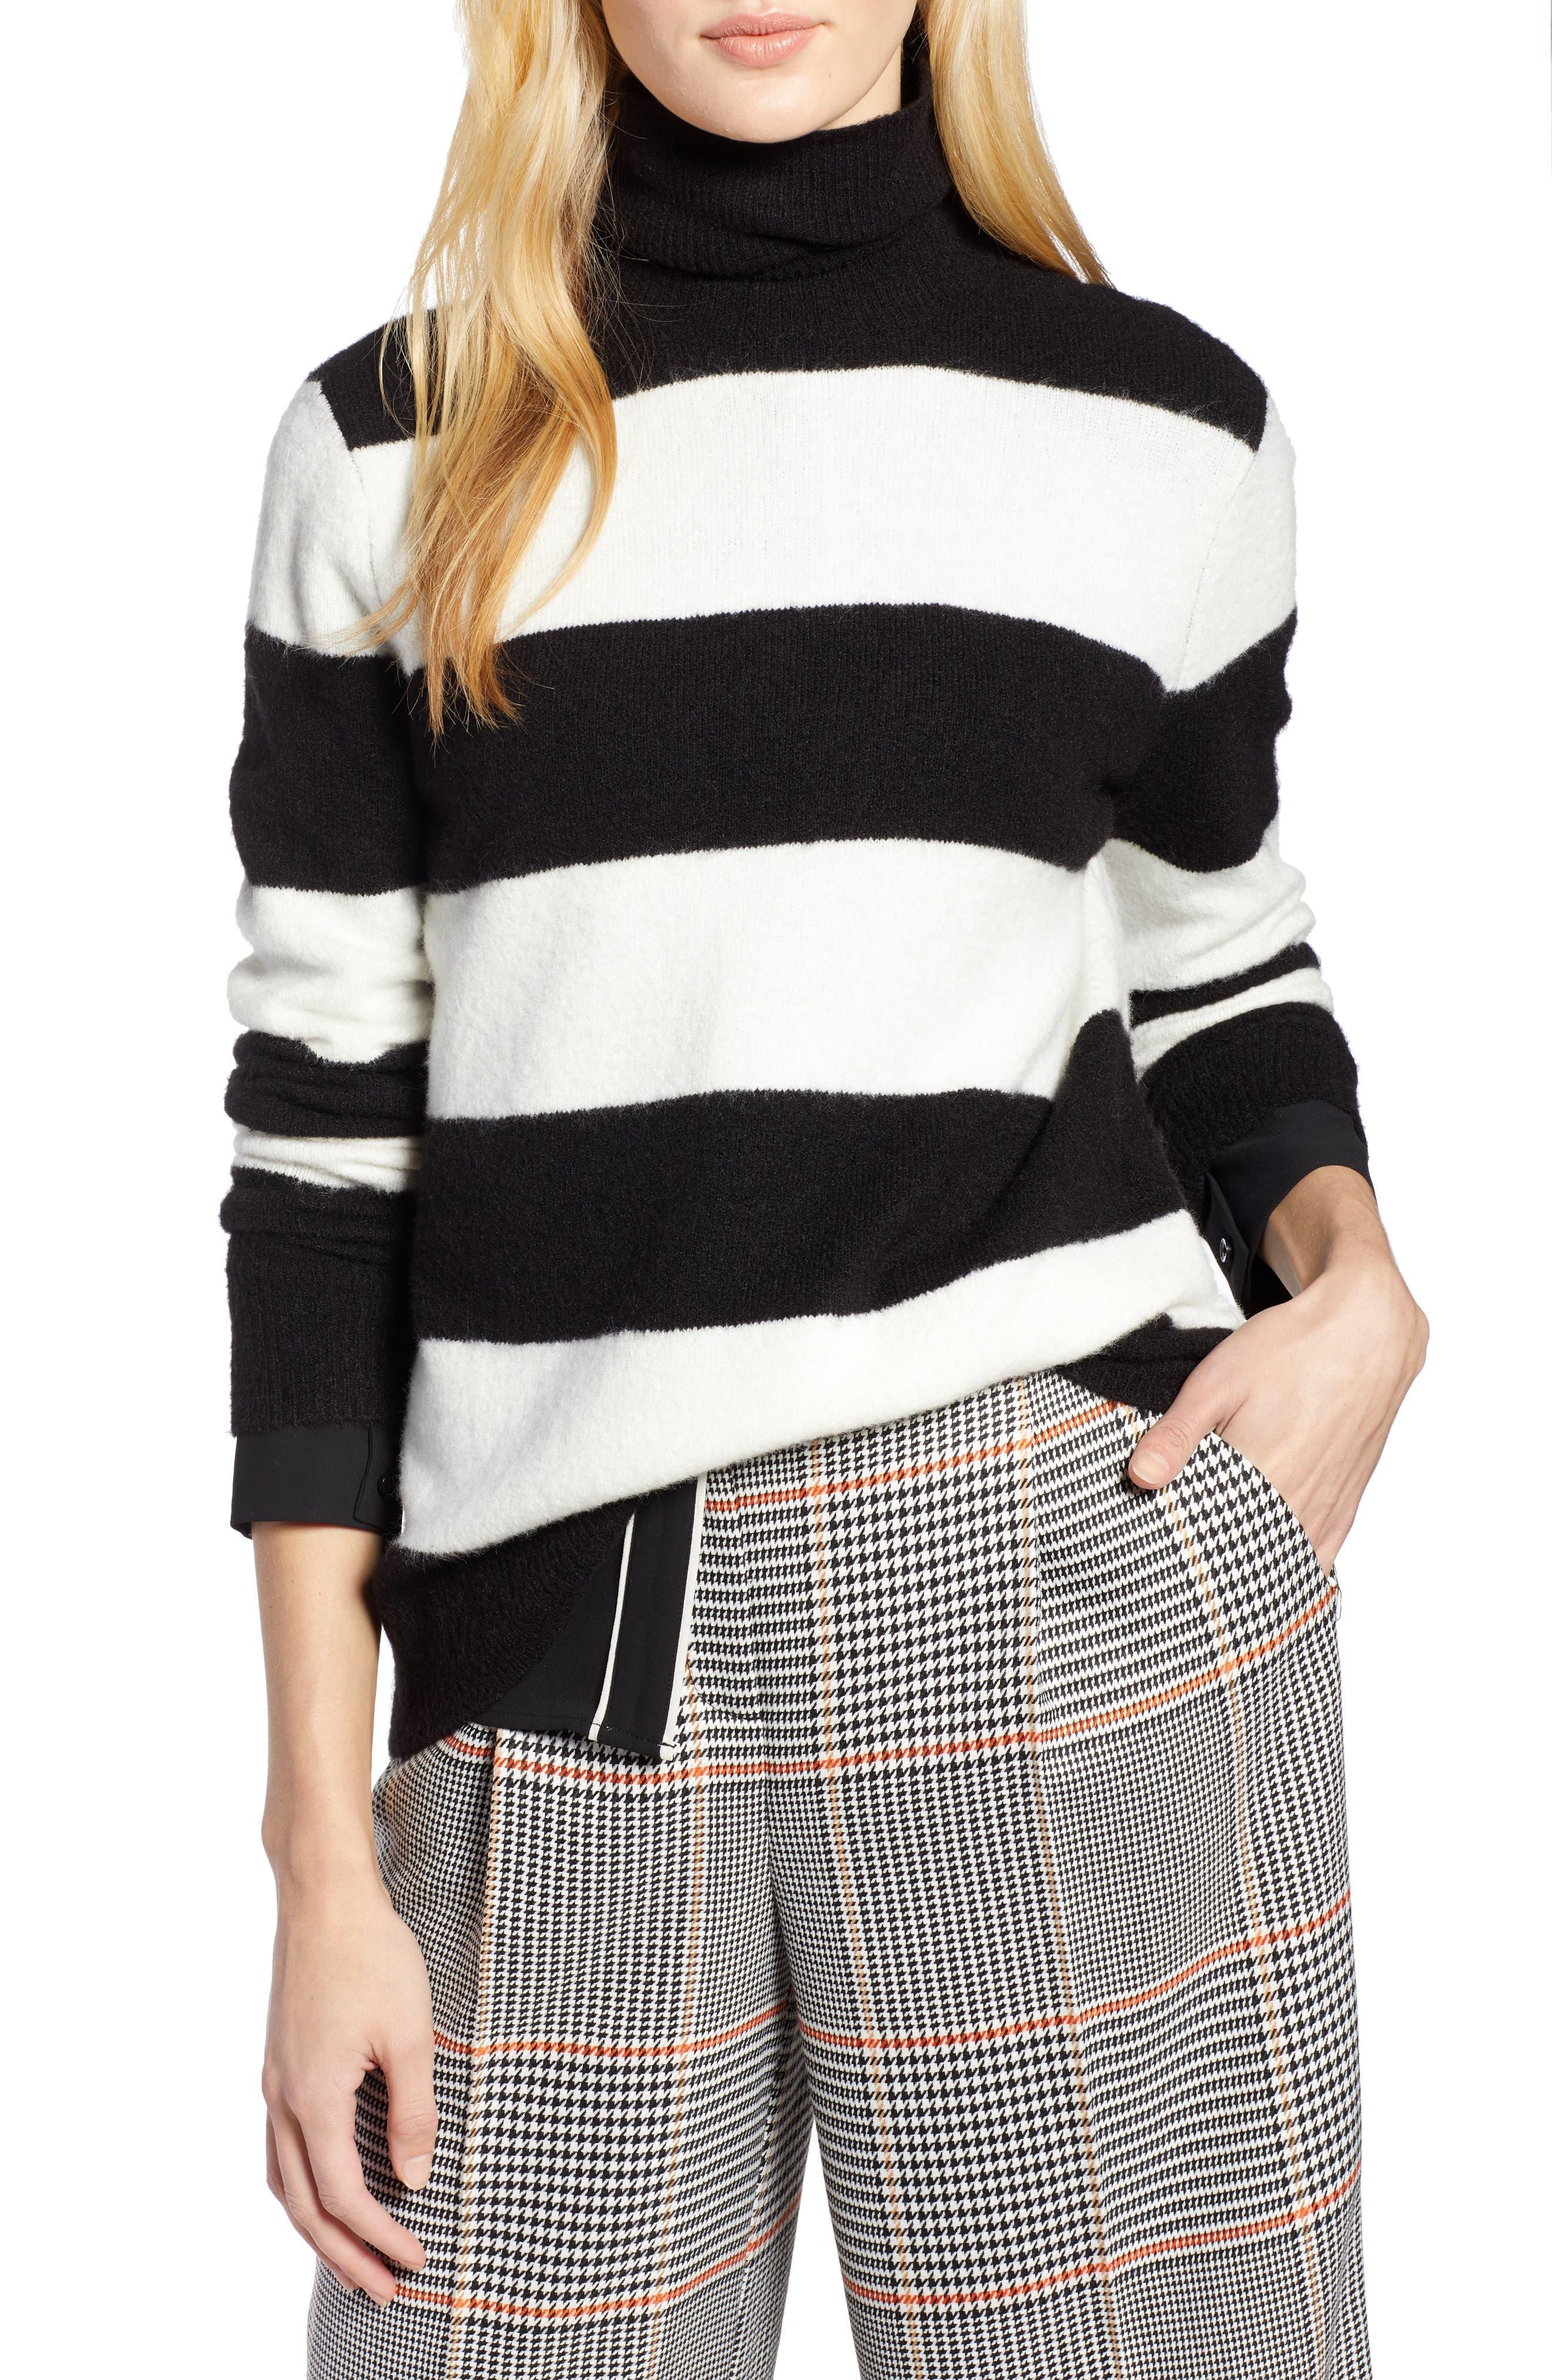 x Atlantic-Pacific Stripe Turtleneck Sweater,                             Main thumbnail 1, color,                             BLACK- IVORY STRIPE